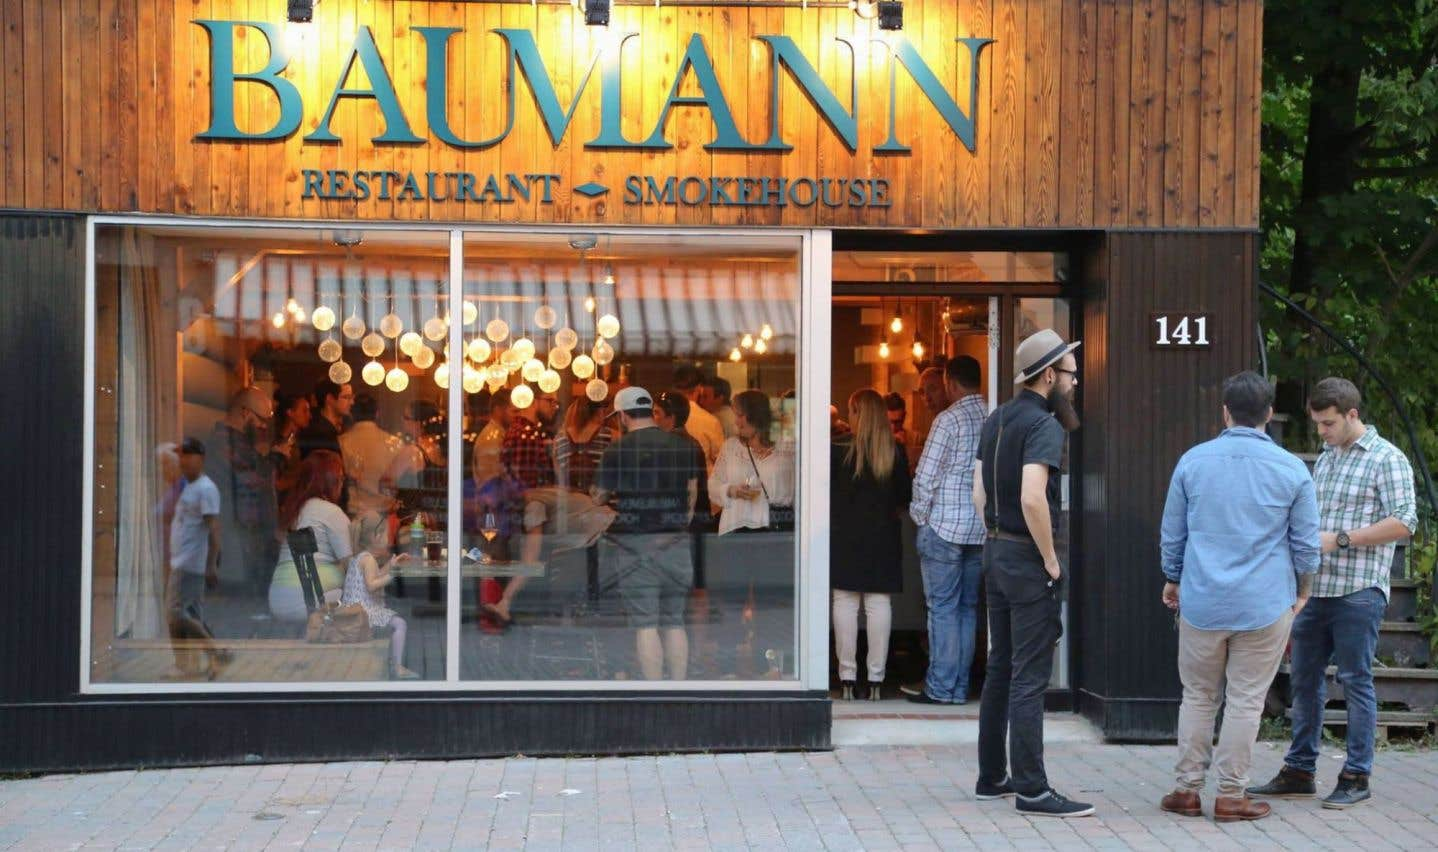 Baumann Smokehouse: Barbes, tatouages et fine cuisine